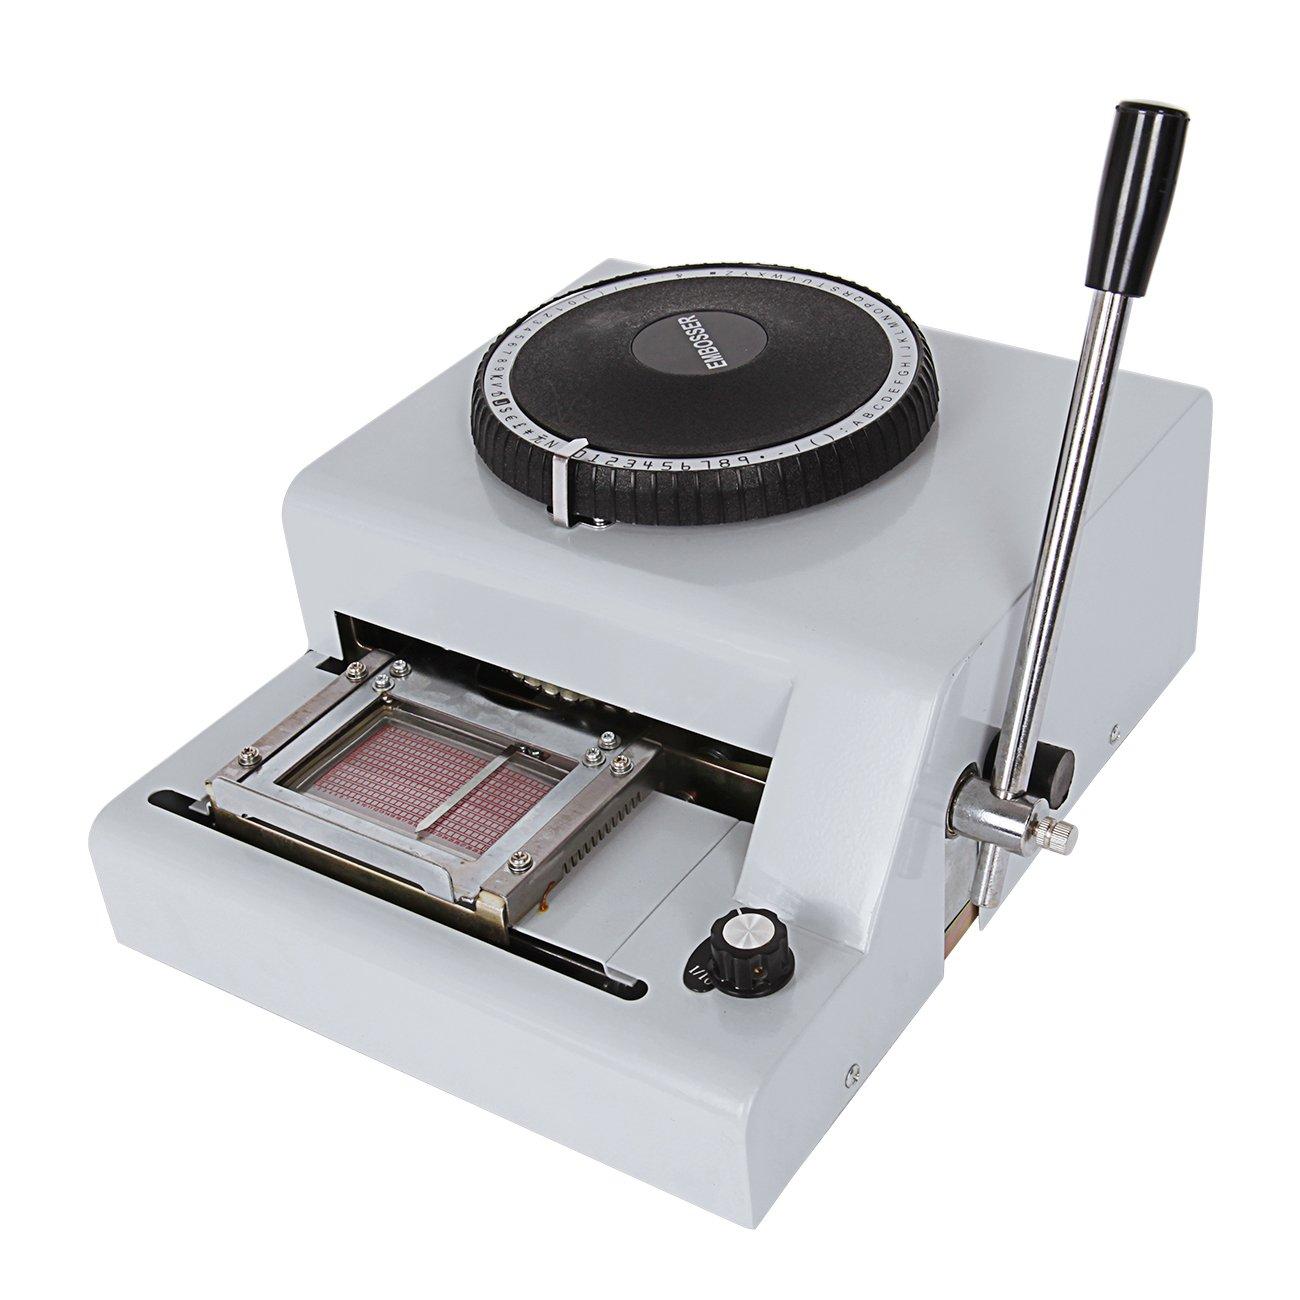 Iglobalbuy 72-character Manuel Card Embosser Credit ID VIP PVC Card Embossing Machine